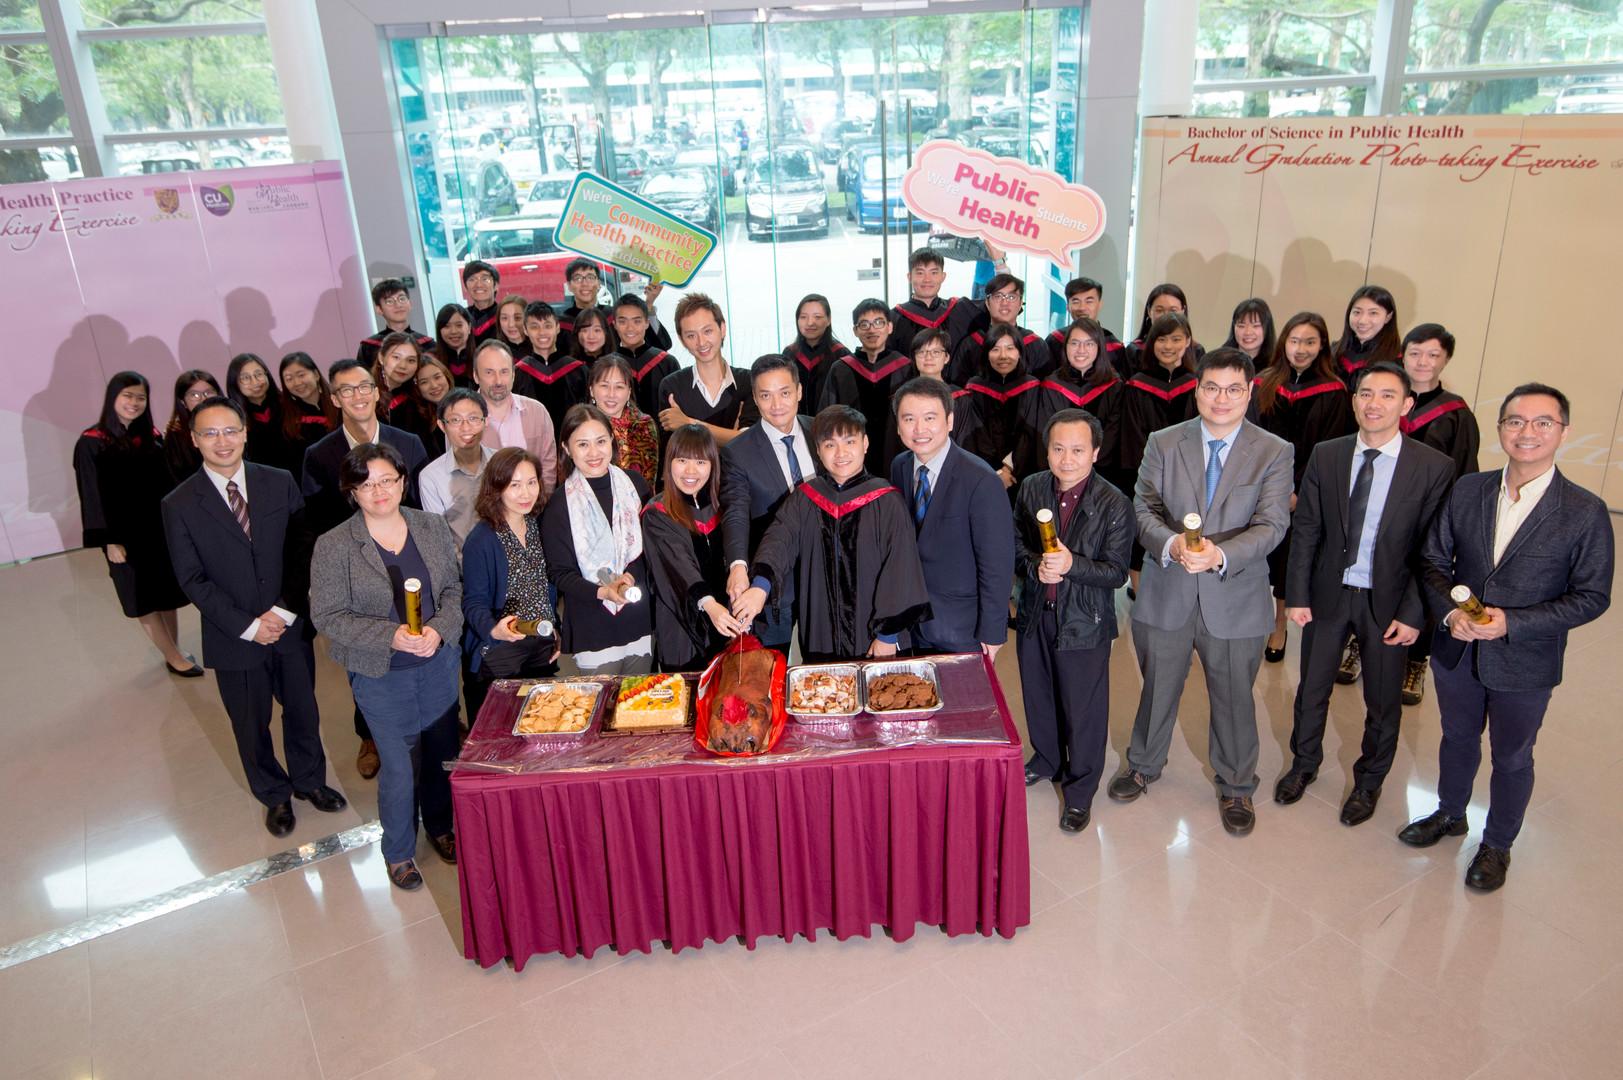 Community Health Practice & Public Health Graduates